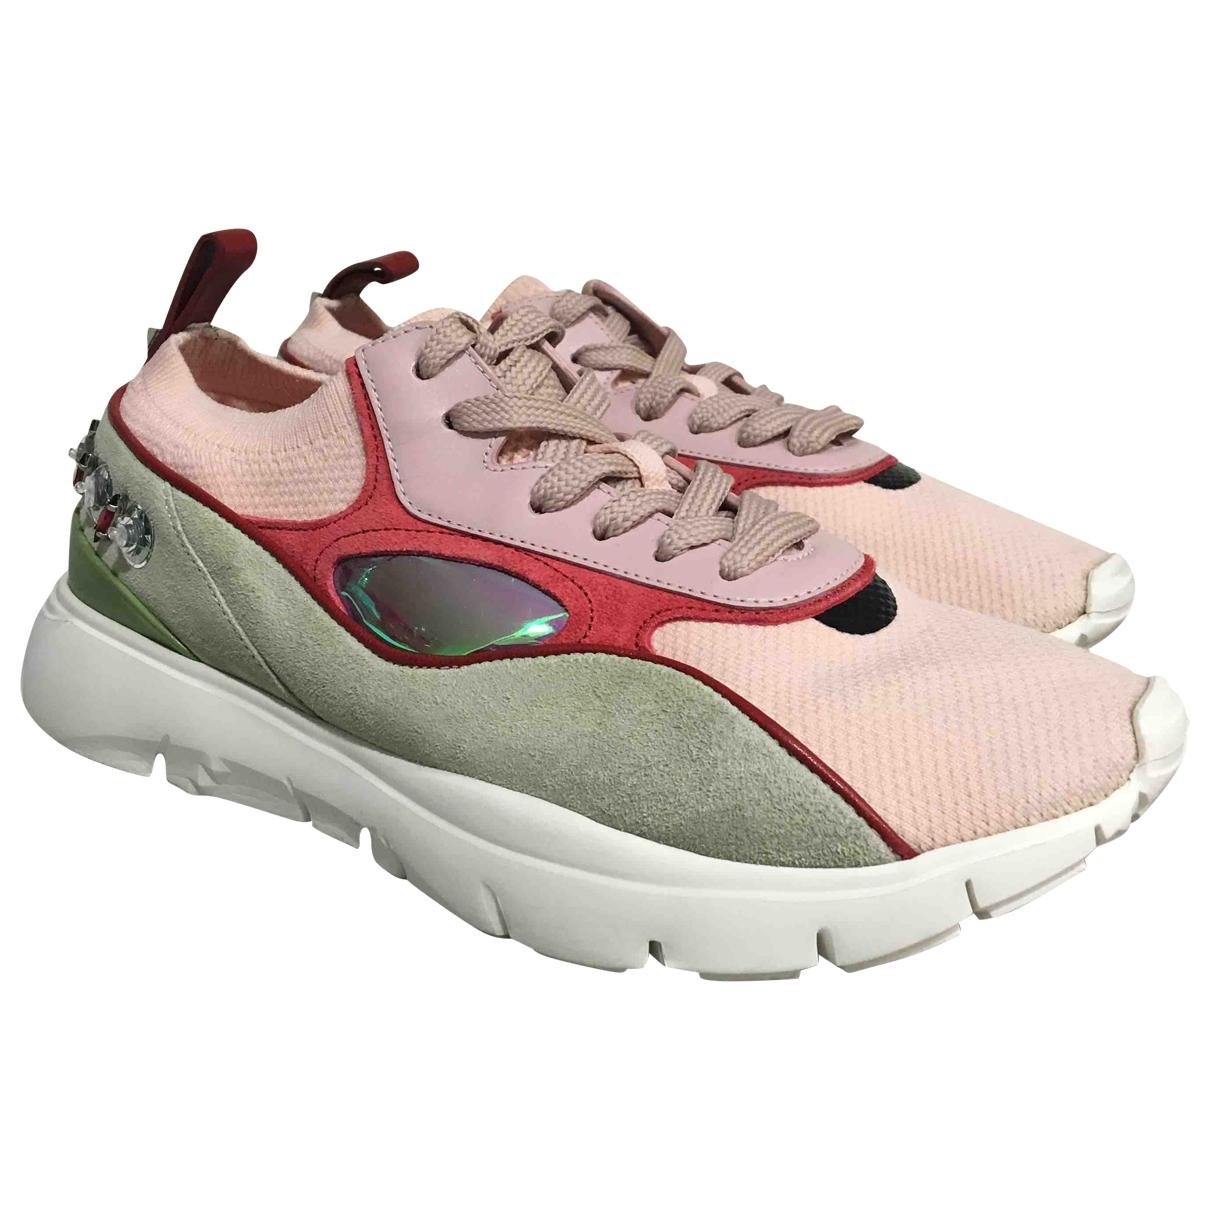 Valentino Garavani - Baskets   pour femme en suede - rose